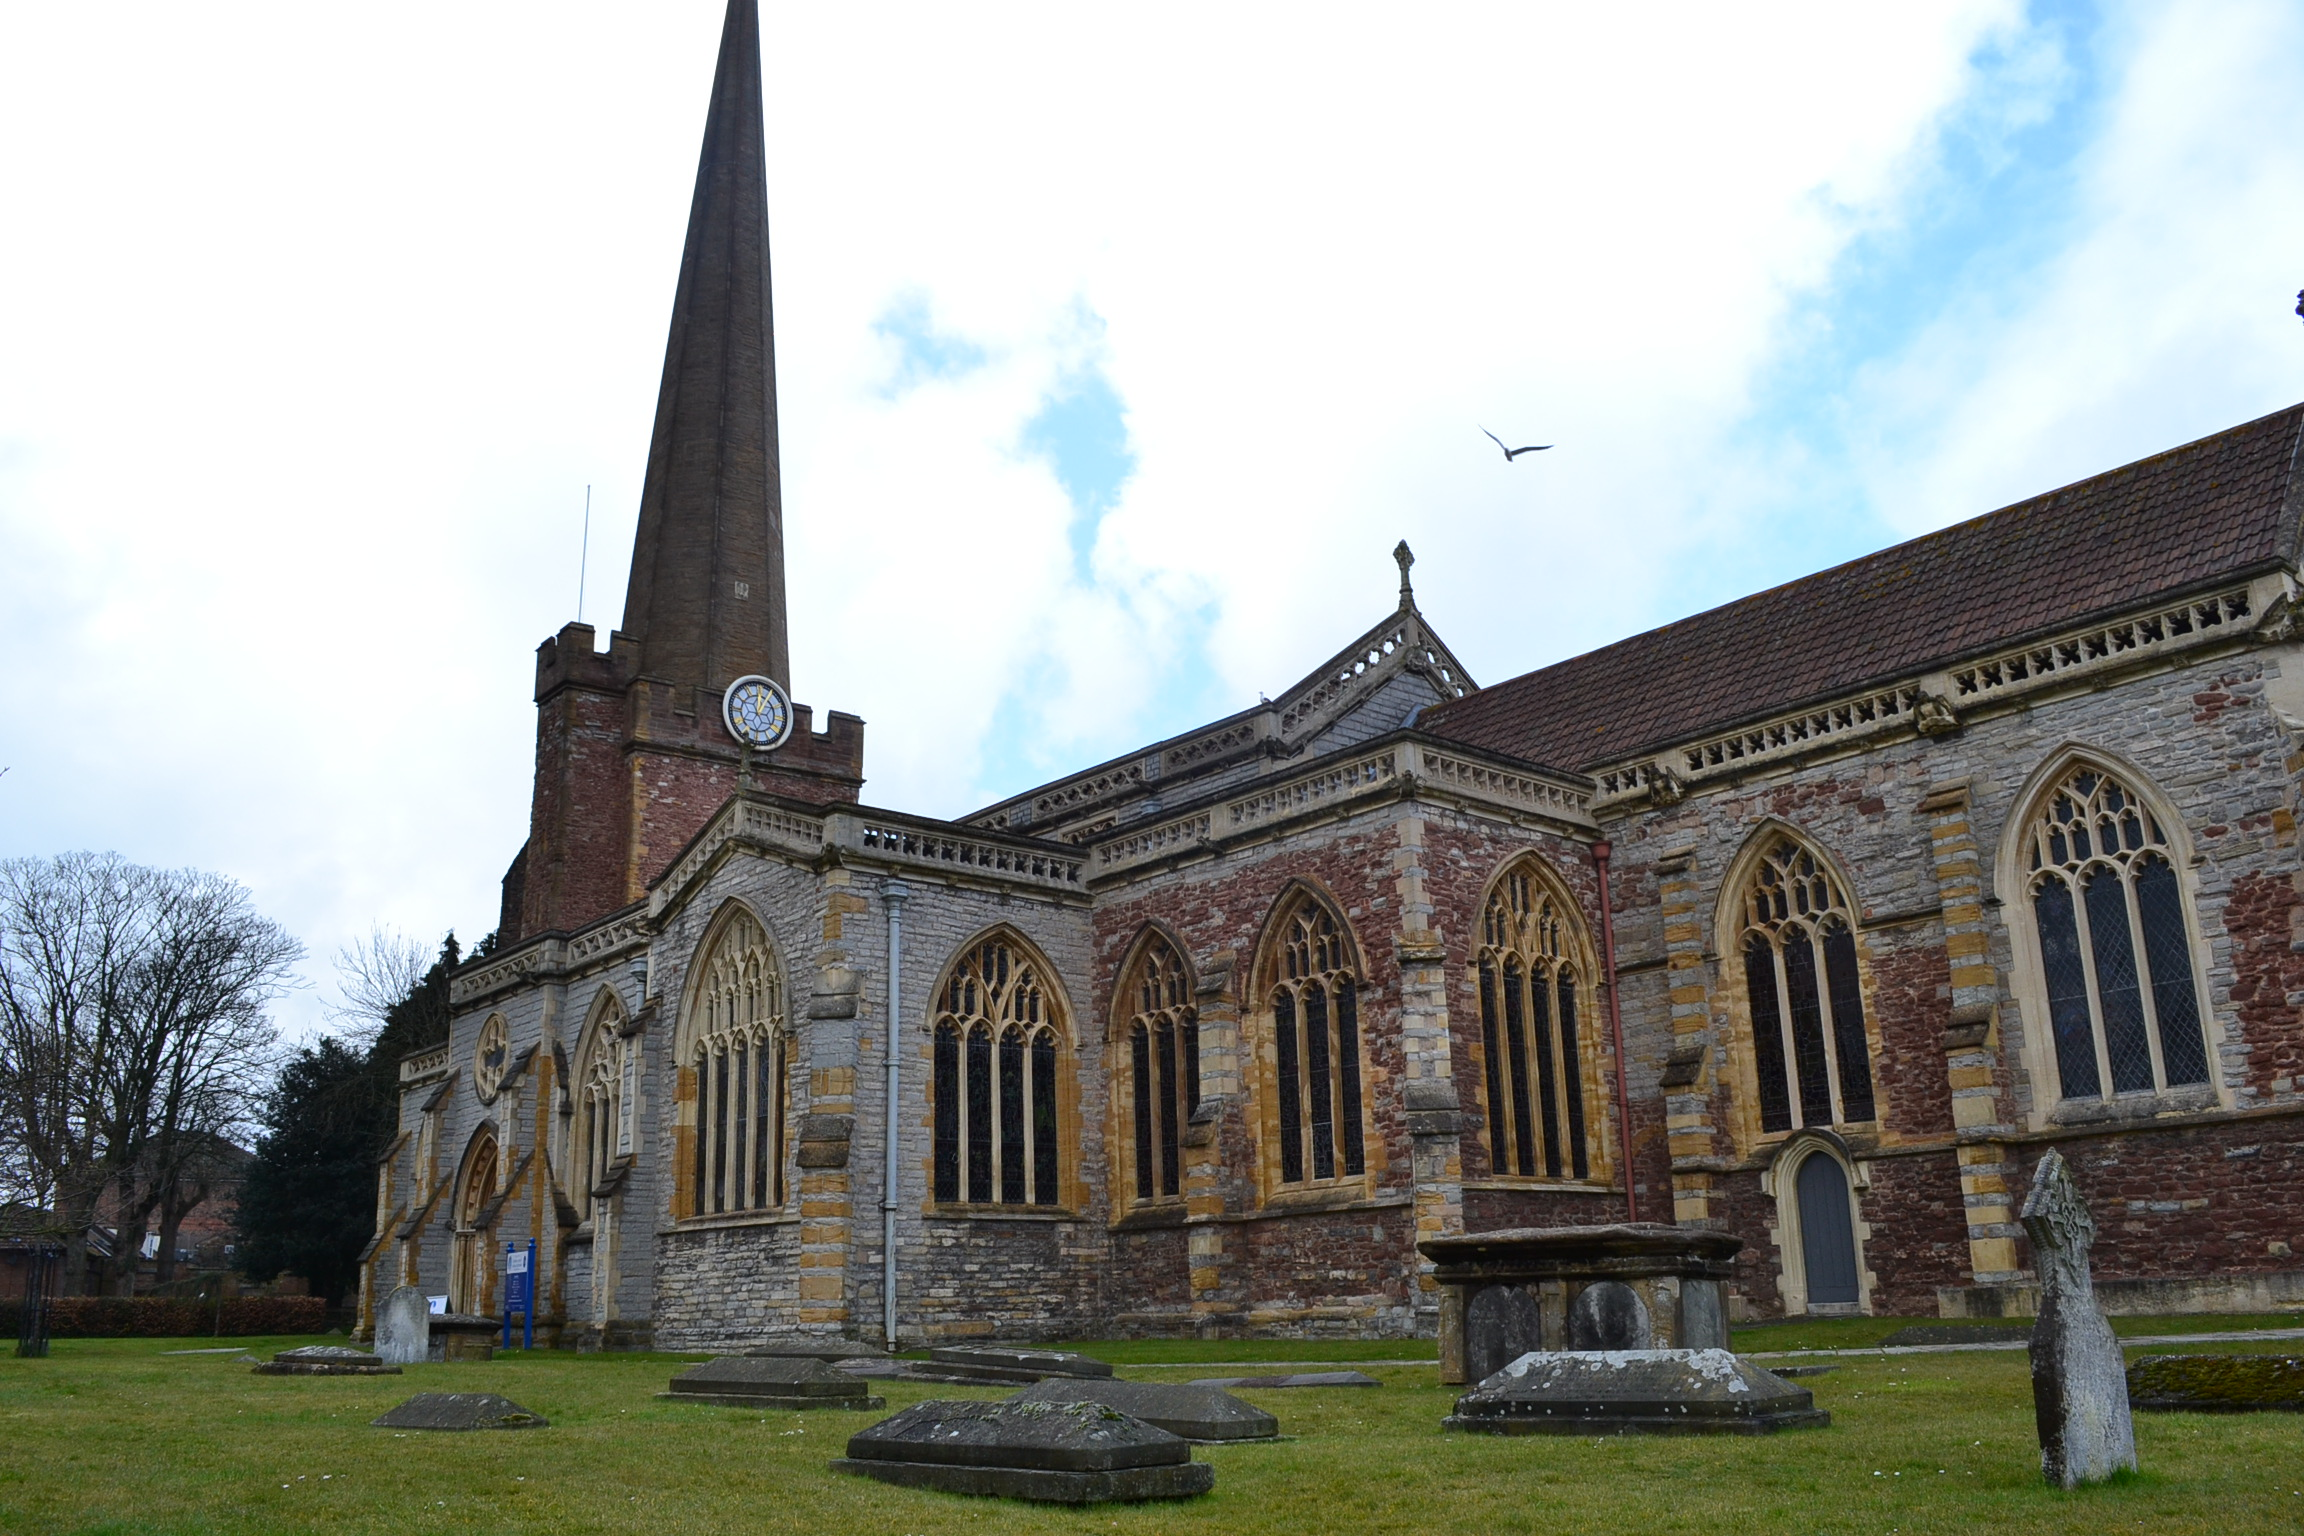 St. Mary's Church, Bridgwater | The Seventeenth Century Lady